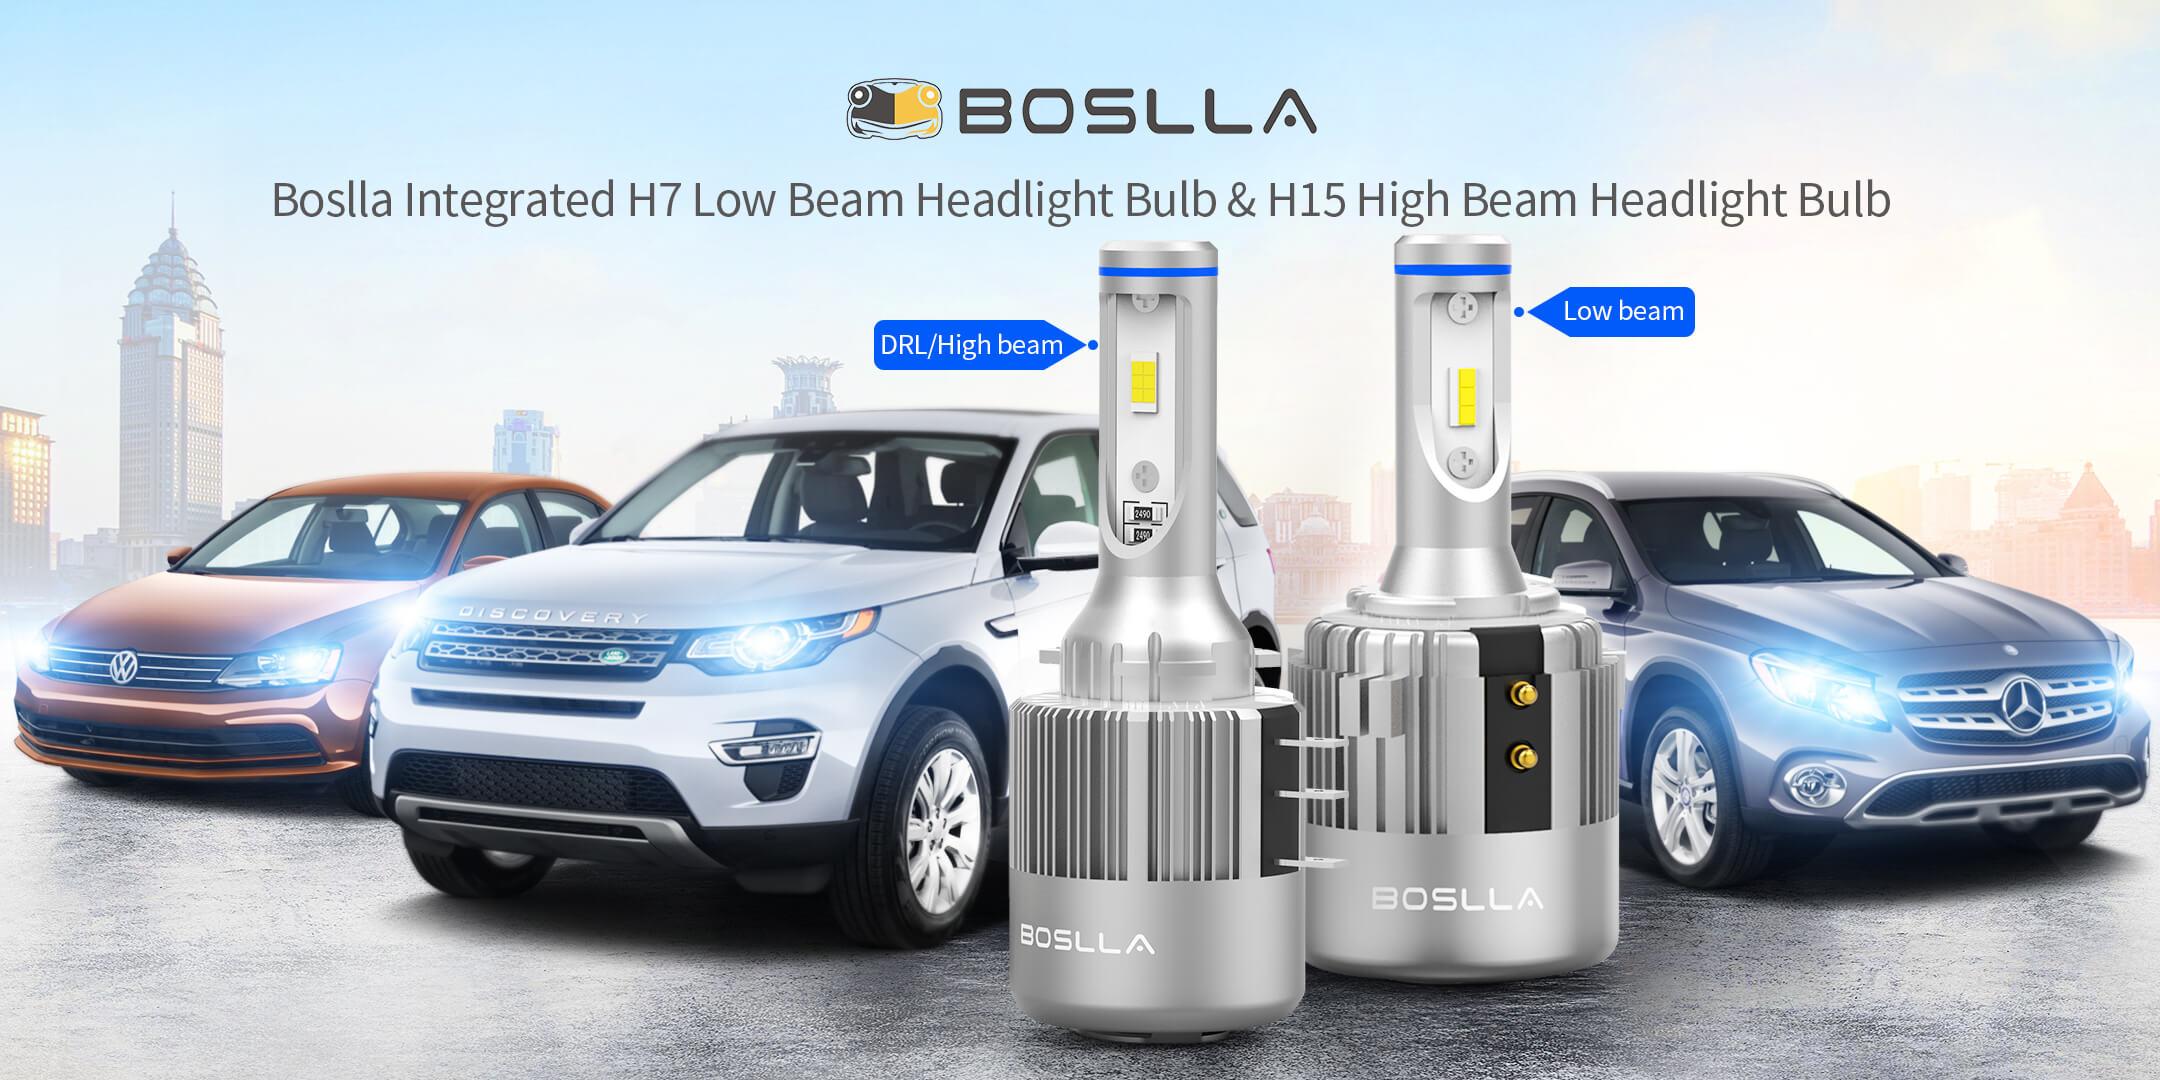 www.boslla.com